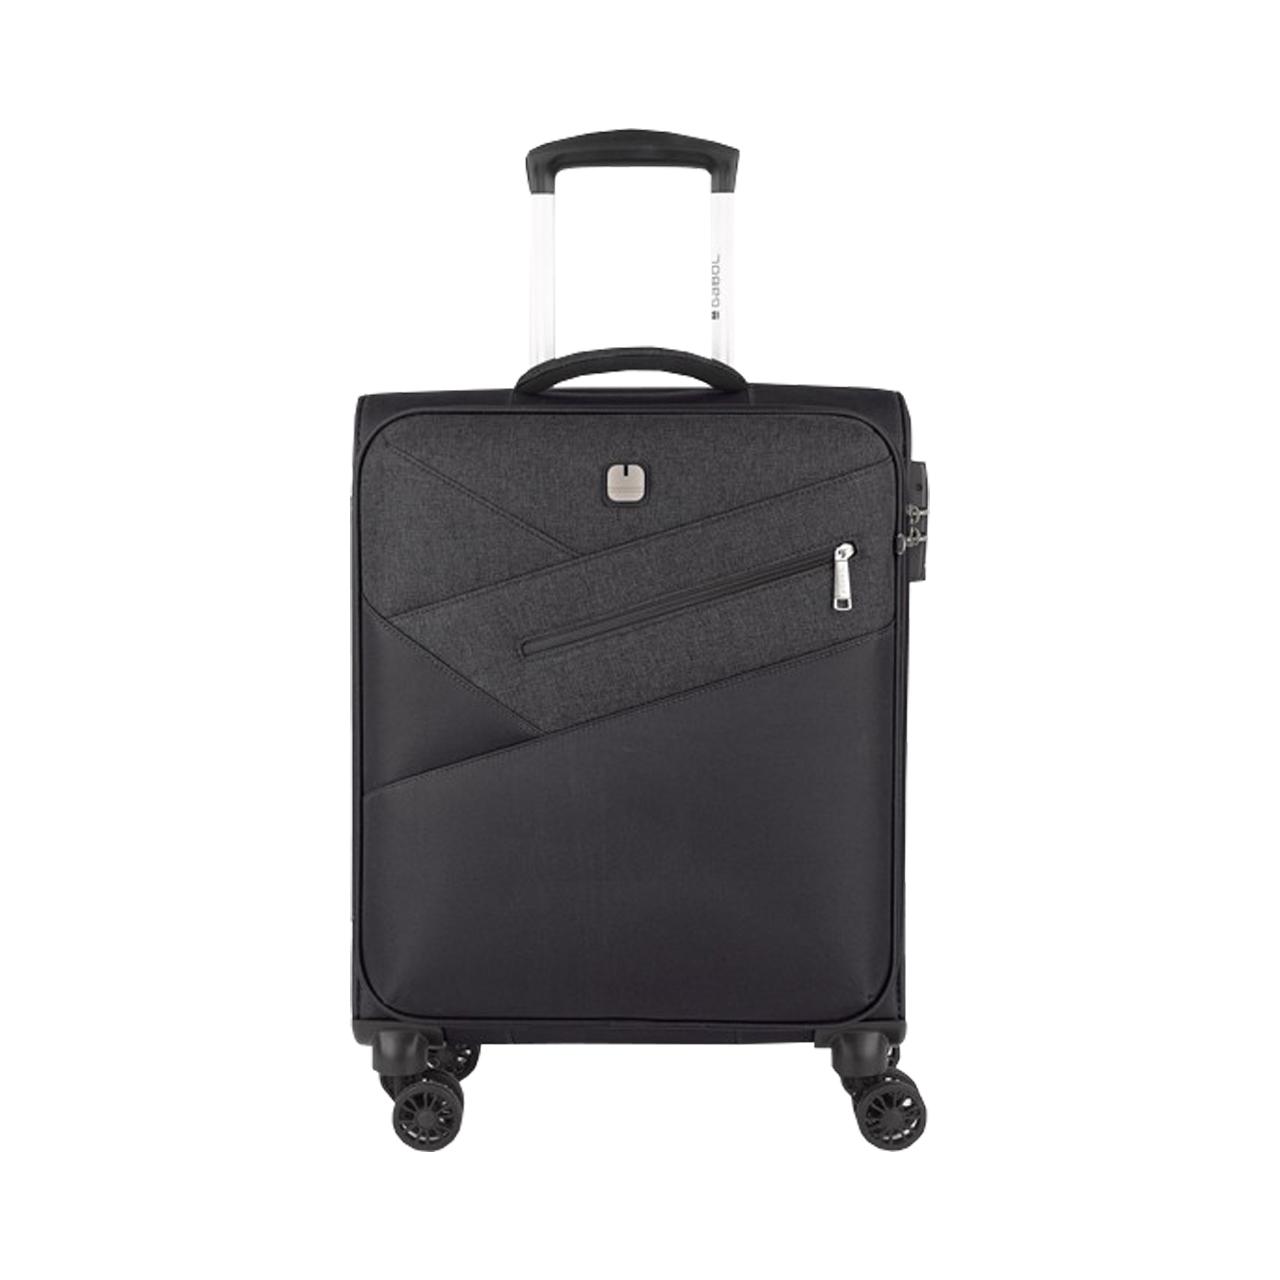 چمدان گابل مدل Mailer  سایز کوچک